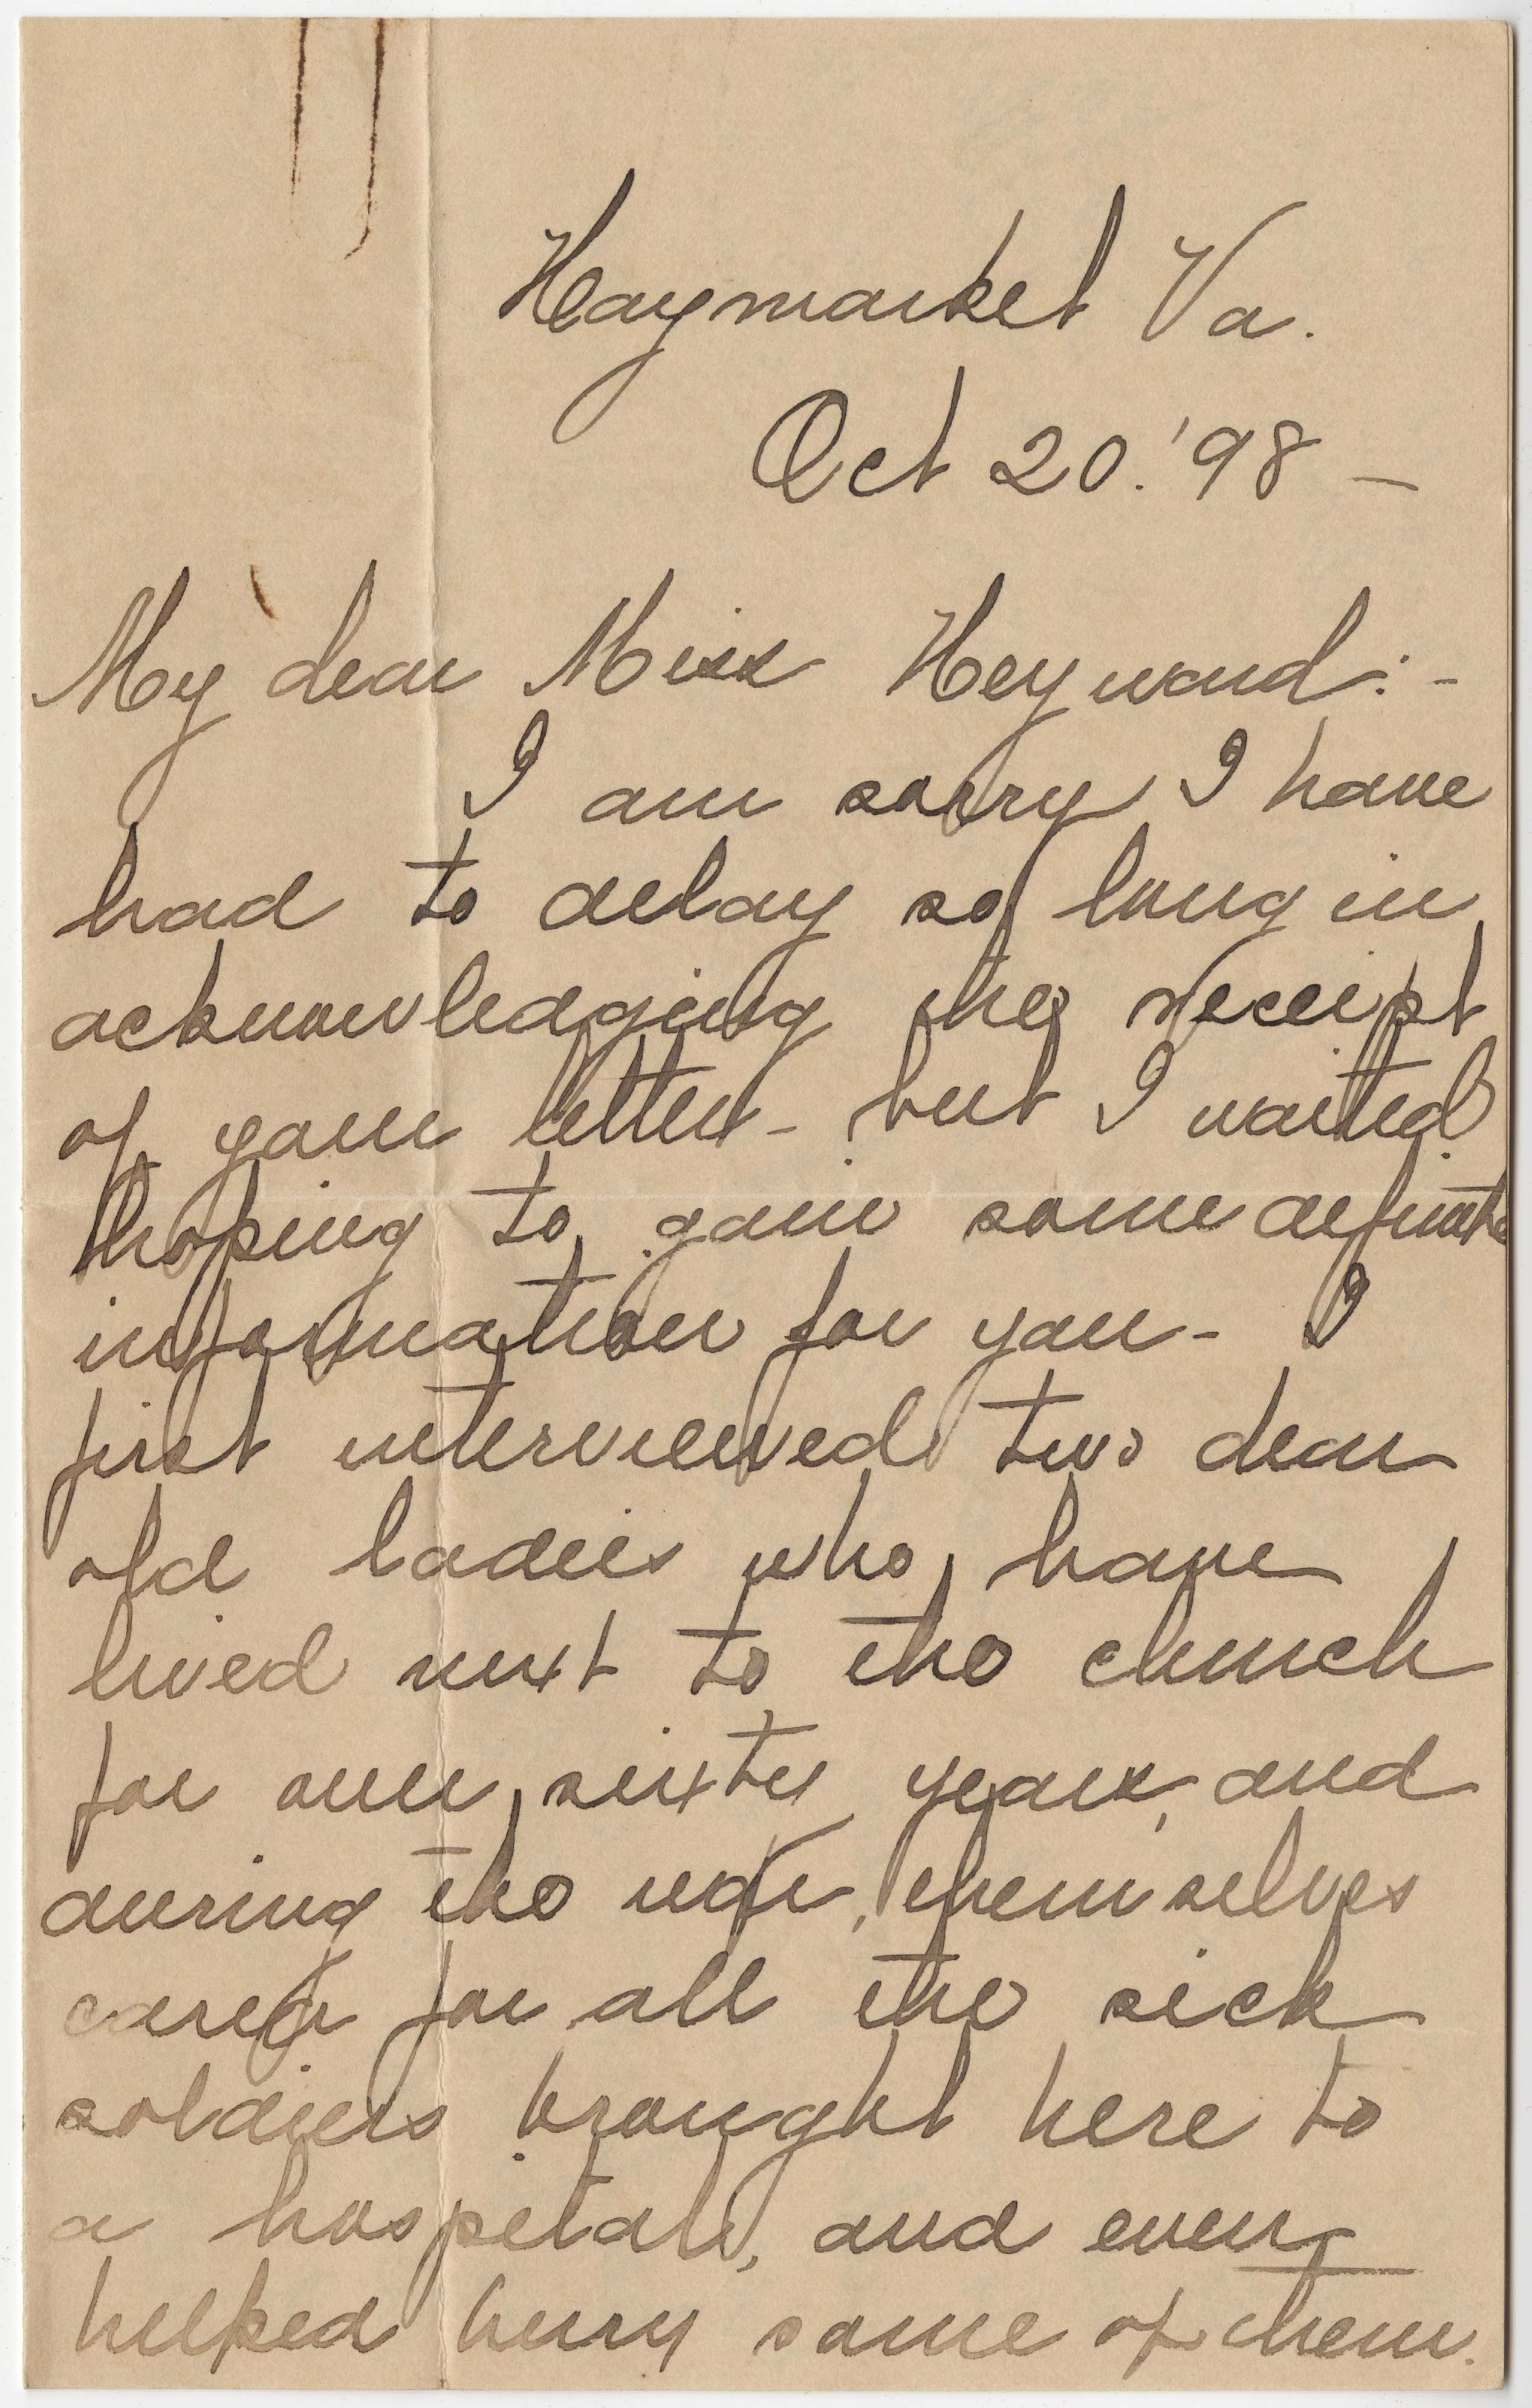 355. Nellie B. Clarksall to Miss Heyward -- October 20, 1898